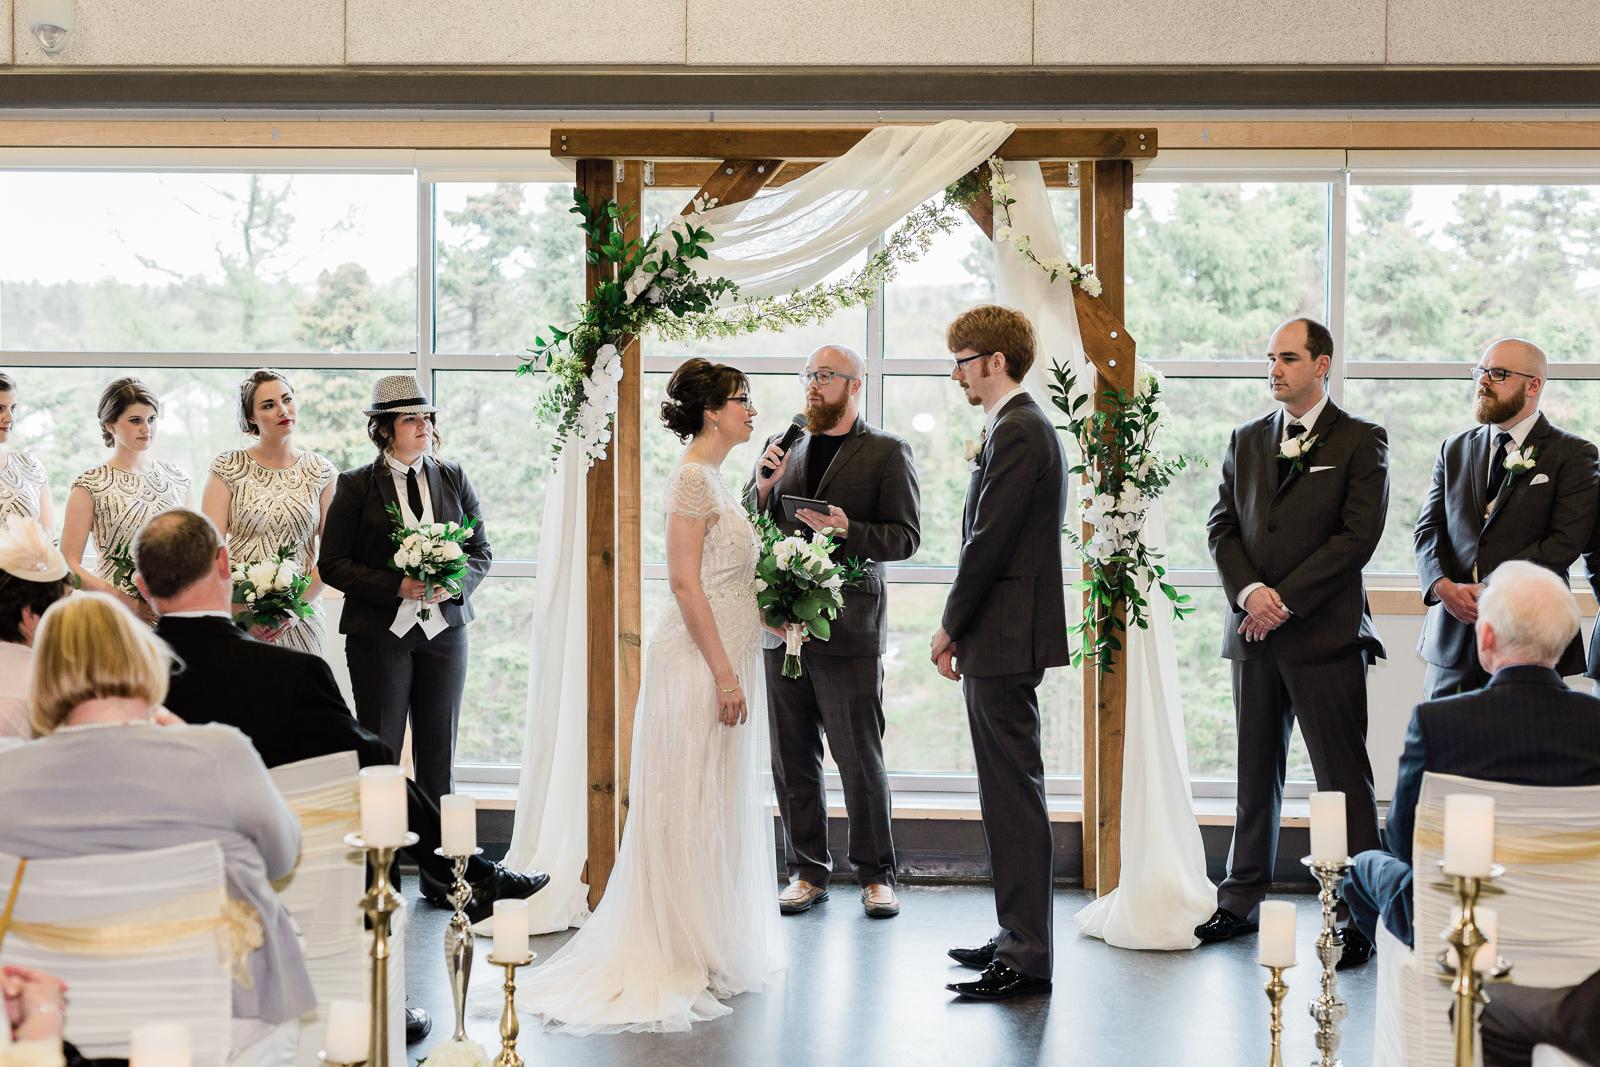 0049manuels-river-st-johns-wedding-photographer.jpg